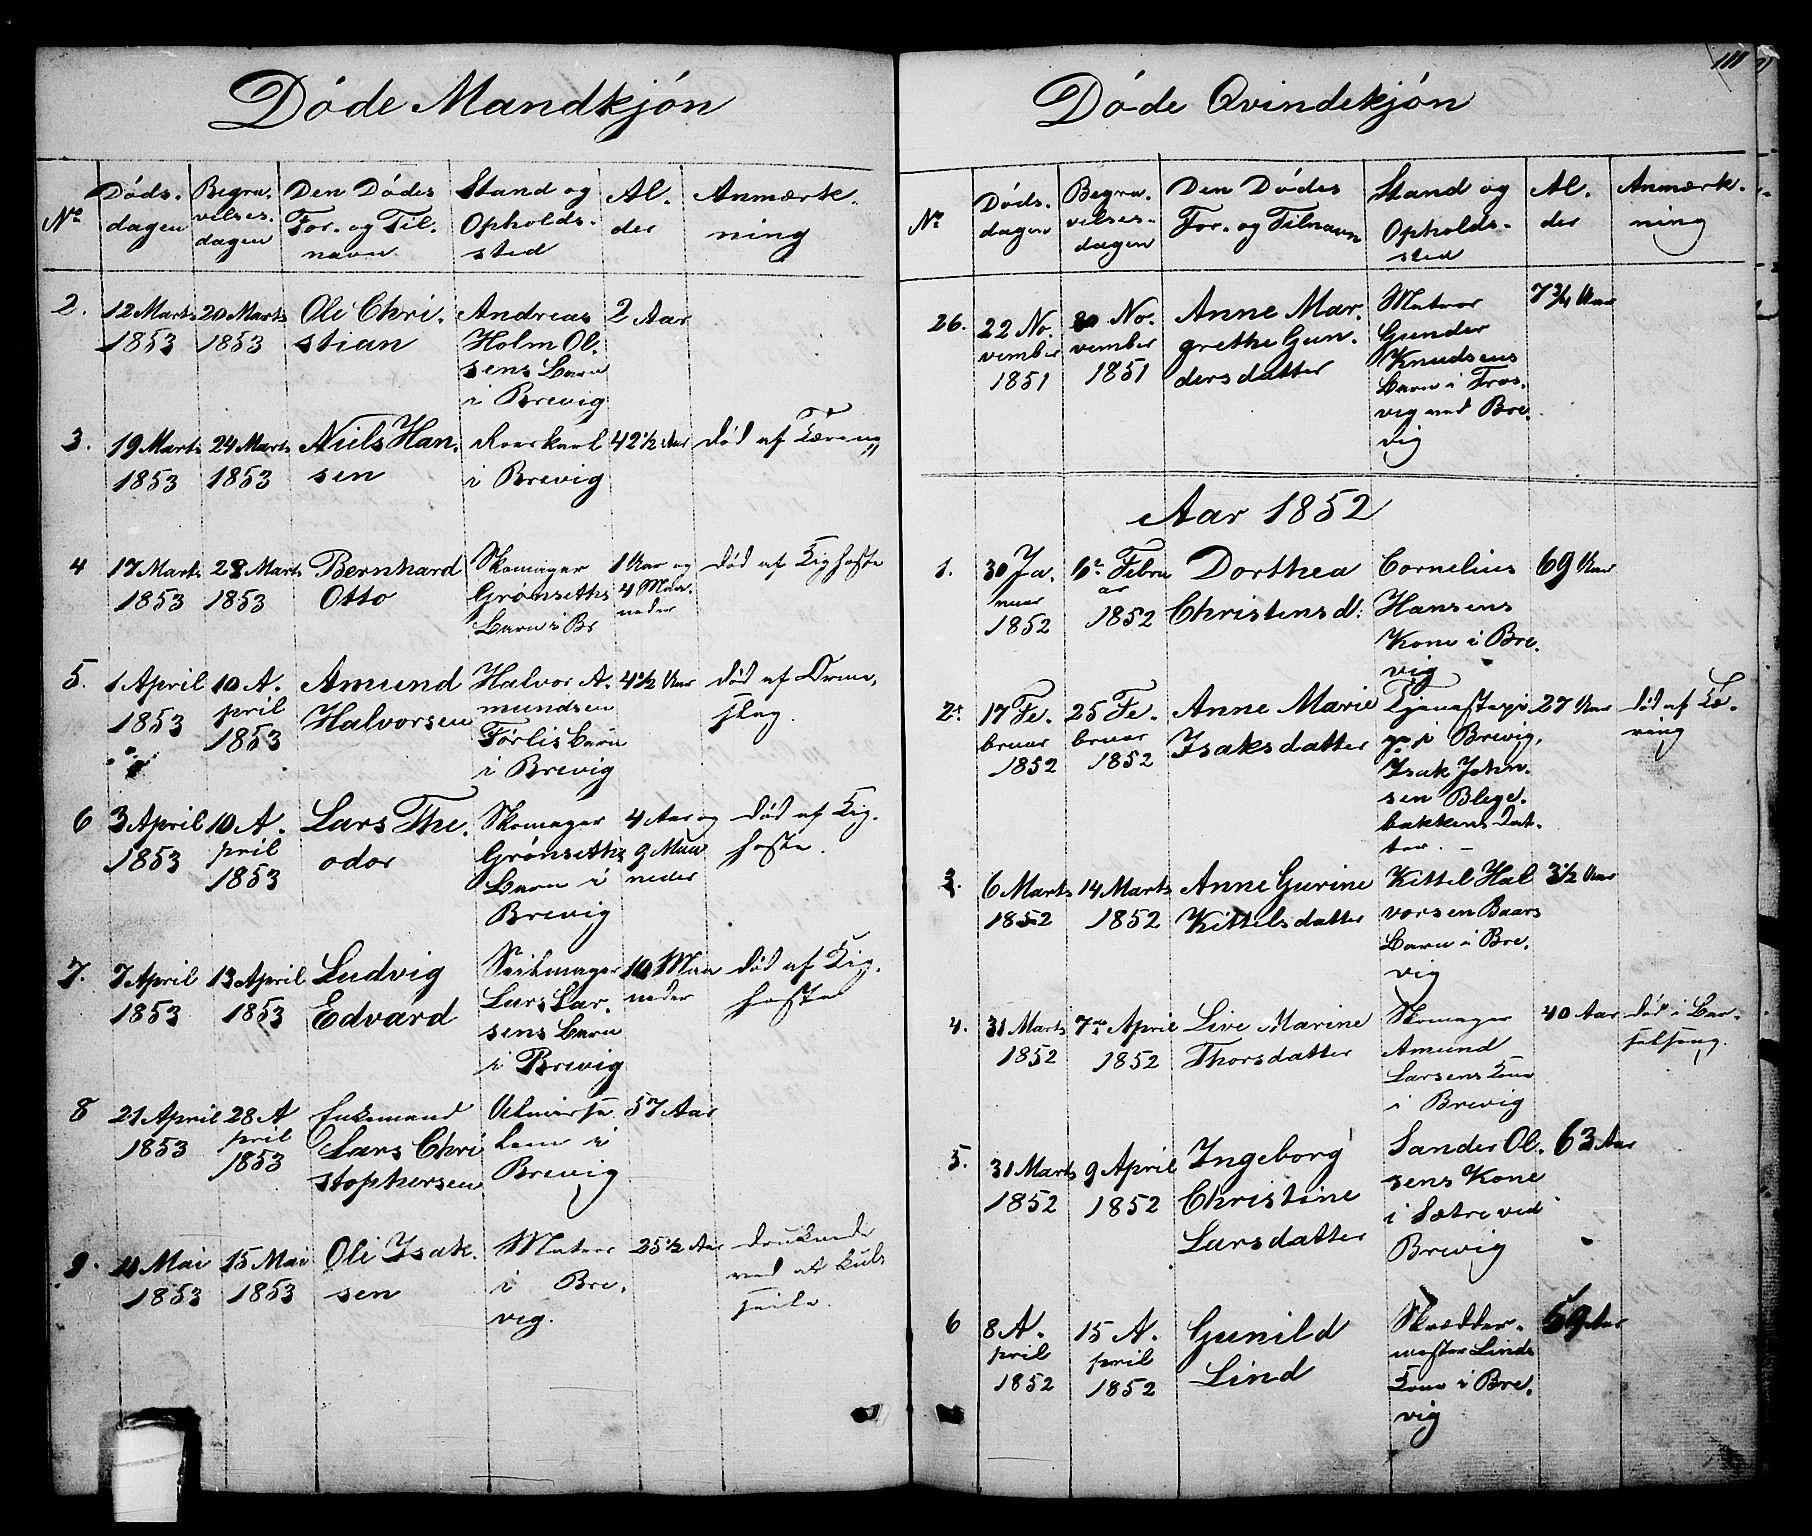 SAKO, Brevik kirkebøker, G/Ga/L0002: Klokkerbok nr. 2, 1846-1865, s. 111